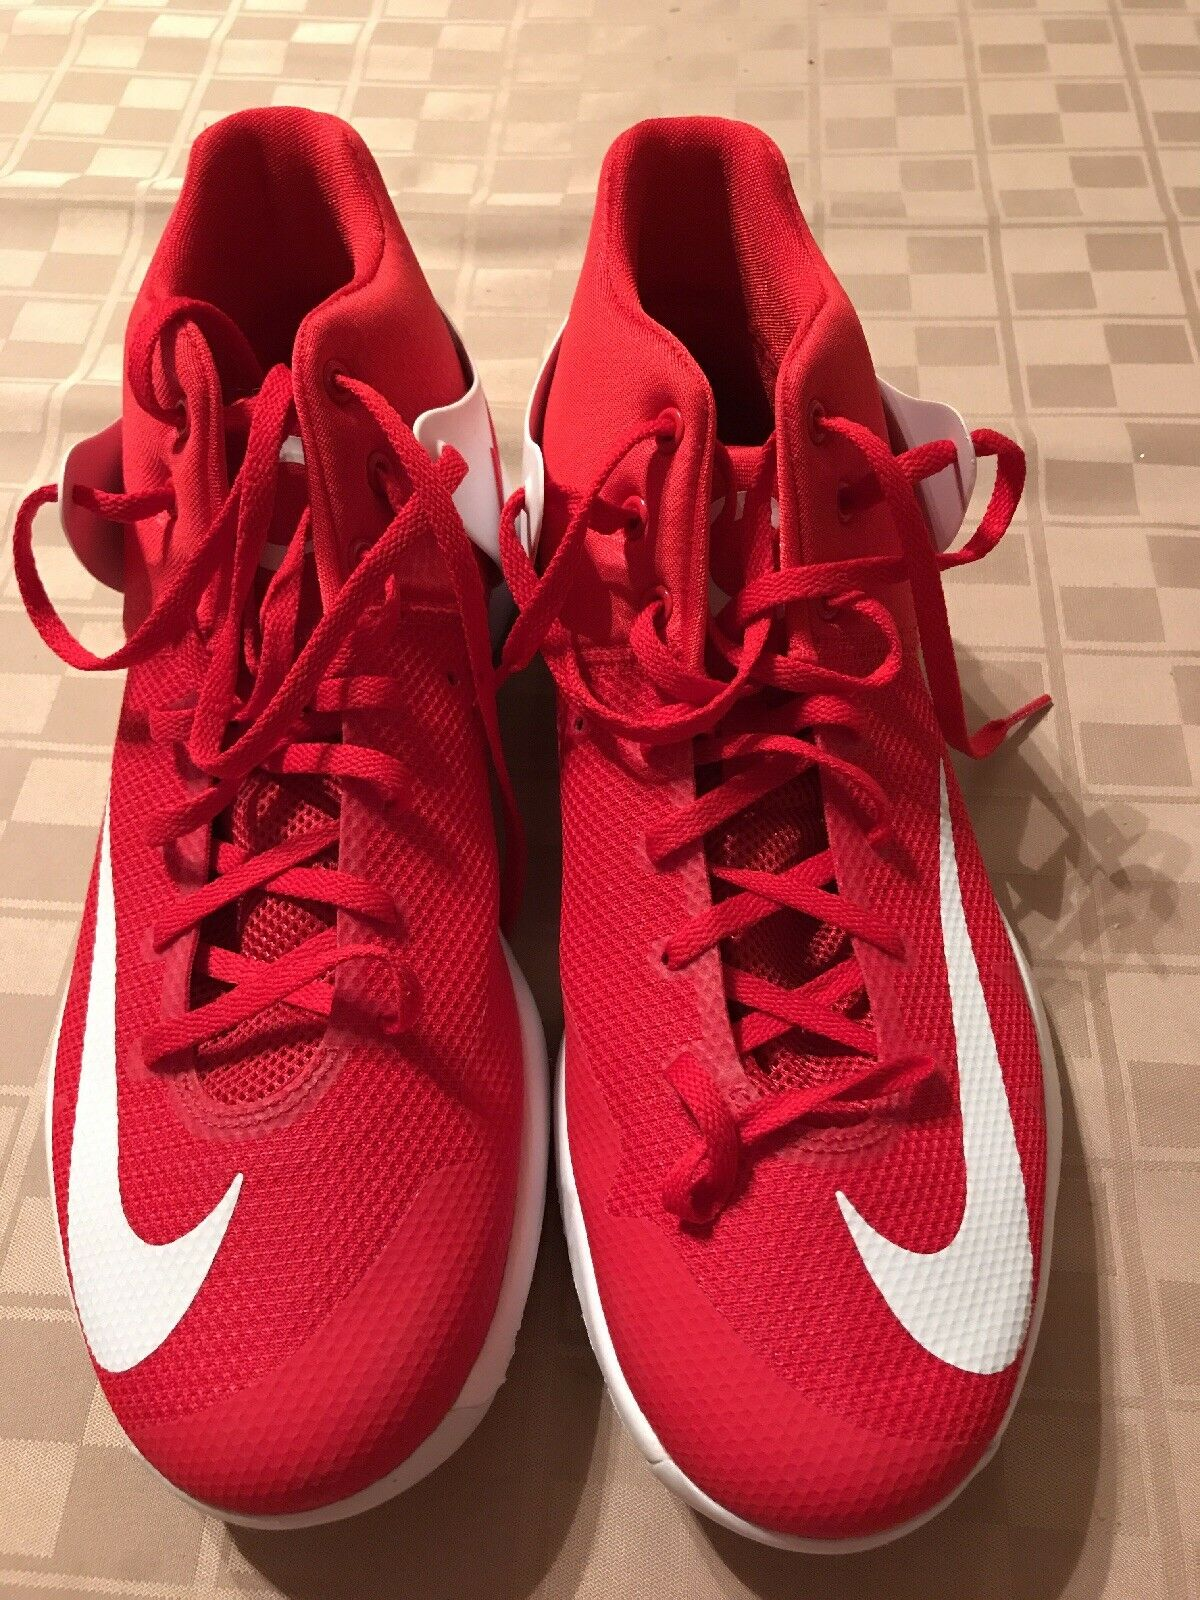 Nike kd trey 5 iv rosso kevin durant scarpe da basket di 10 844590-610 dimensioni